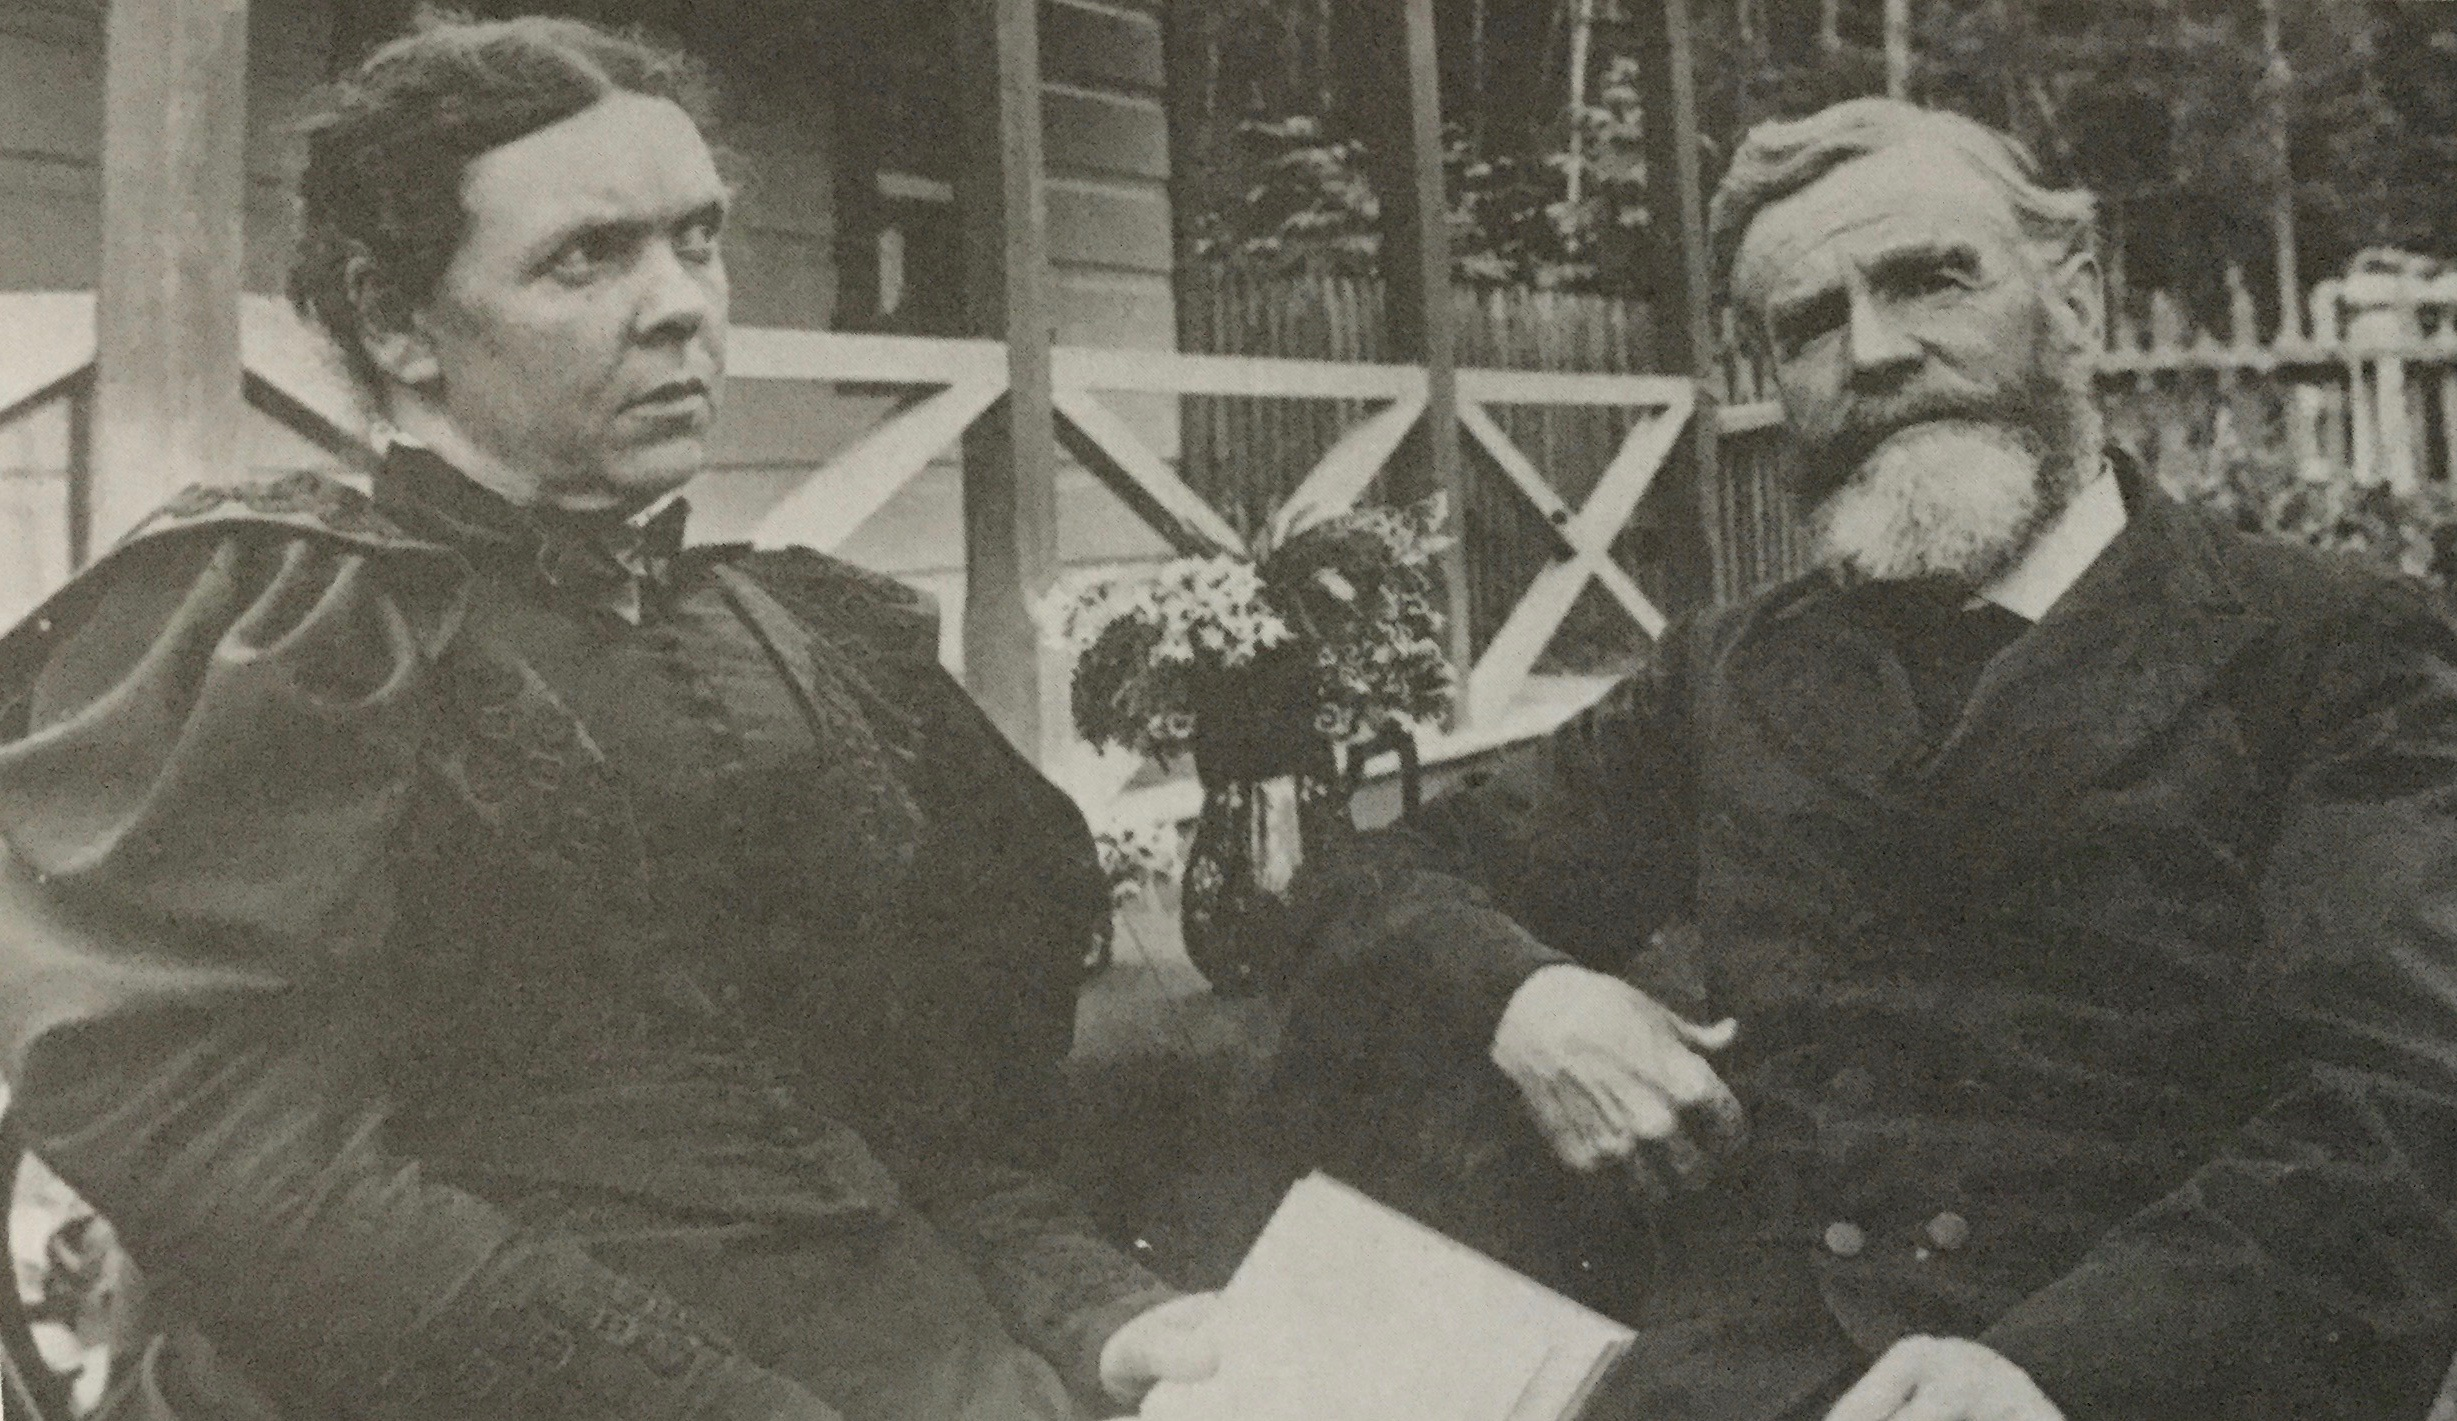 Robert Tomlinson 1842 – 1913